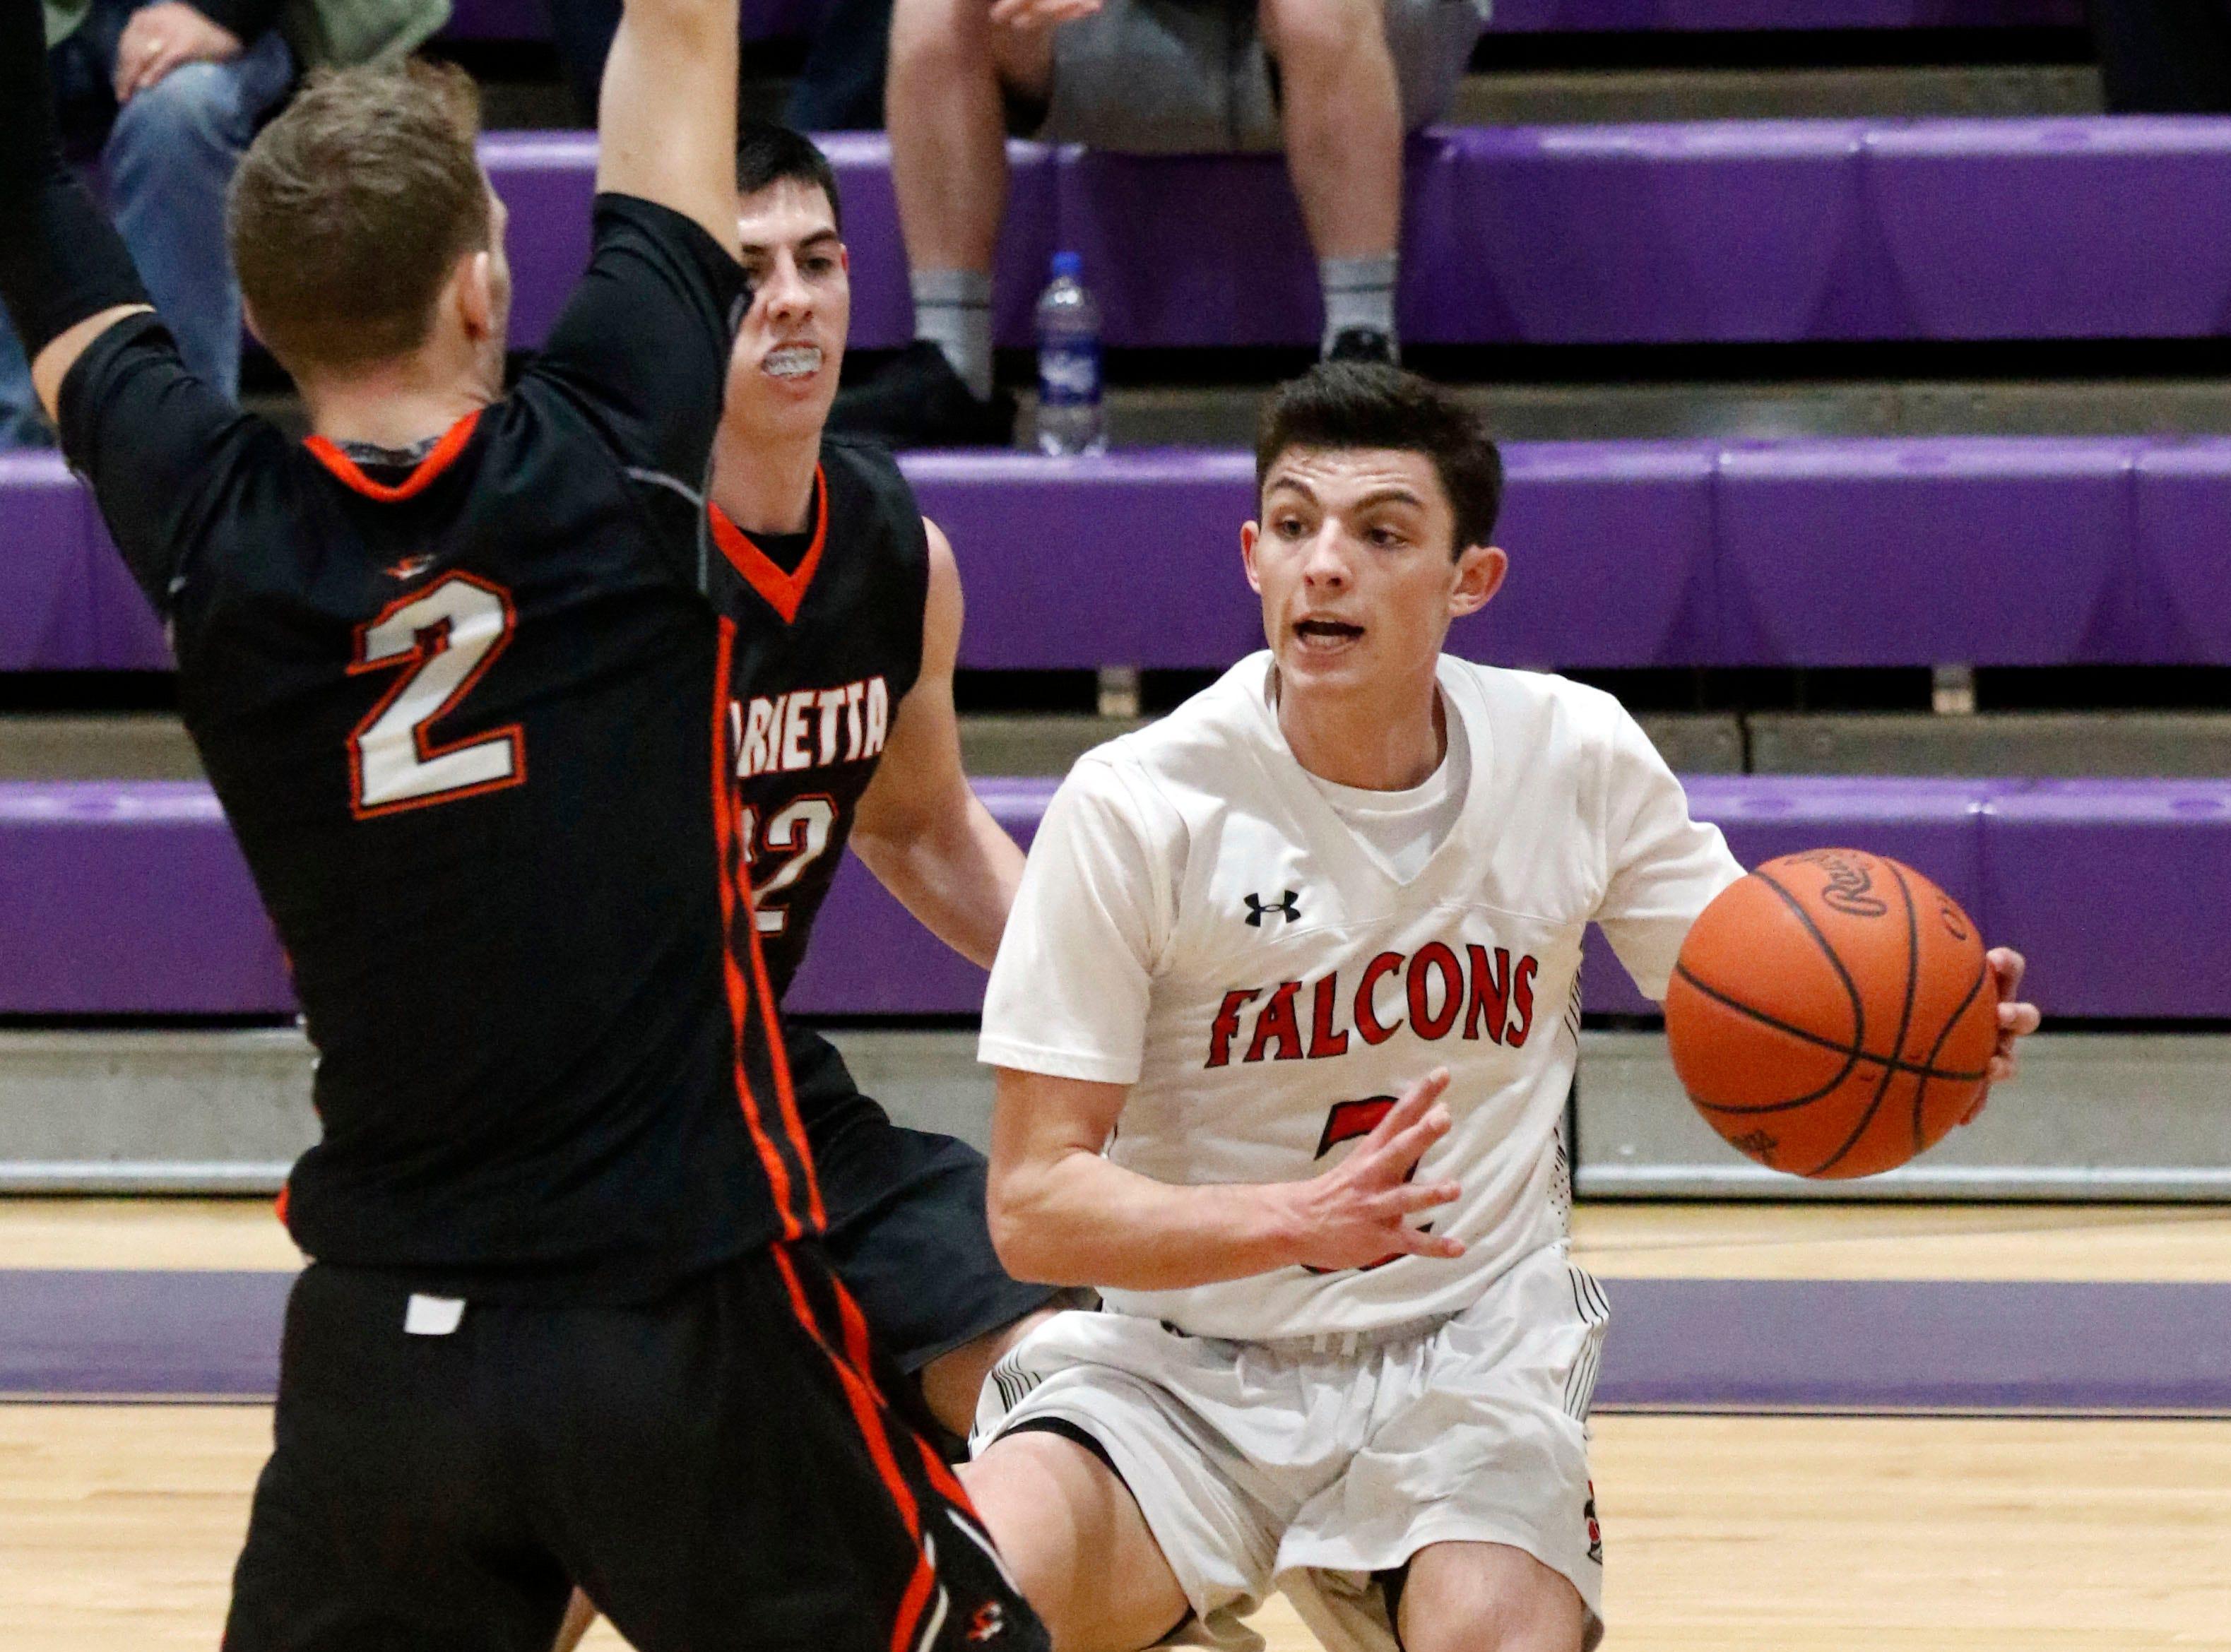 Fairfield Union defeated Marietta 48-33 Saturday, Feb. 23, 2019, at Logan High School in Logan.